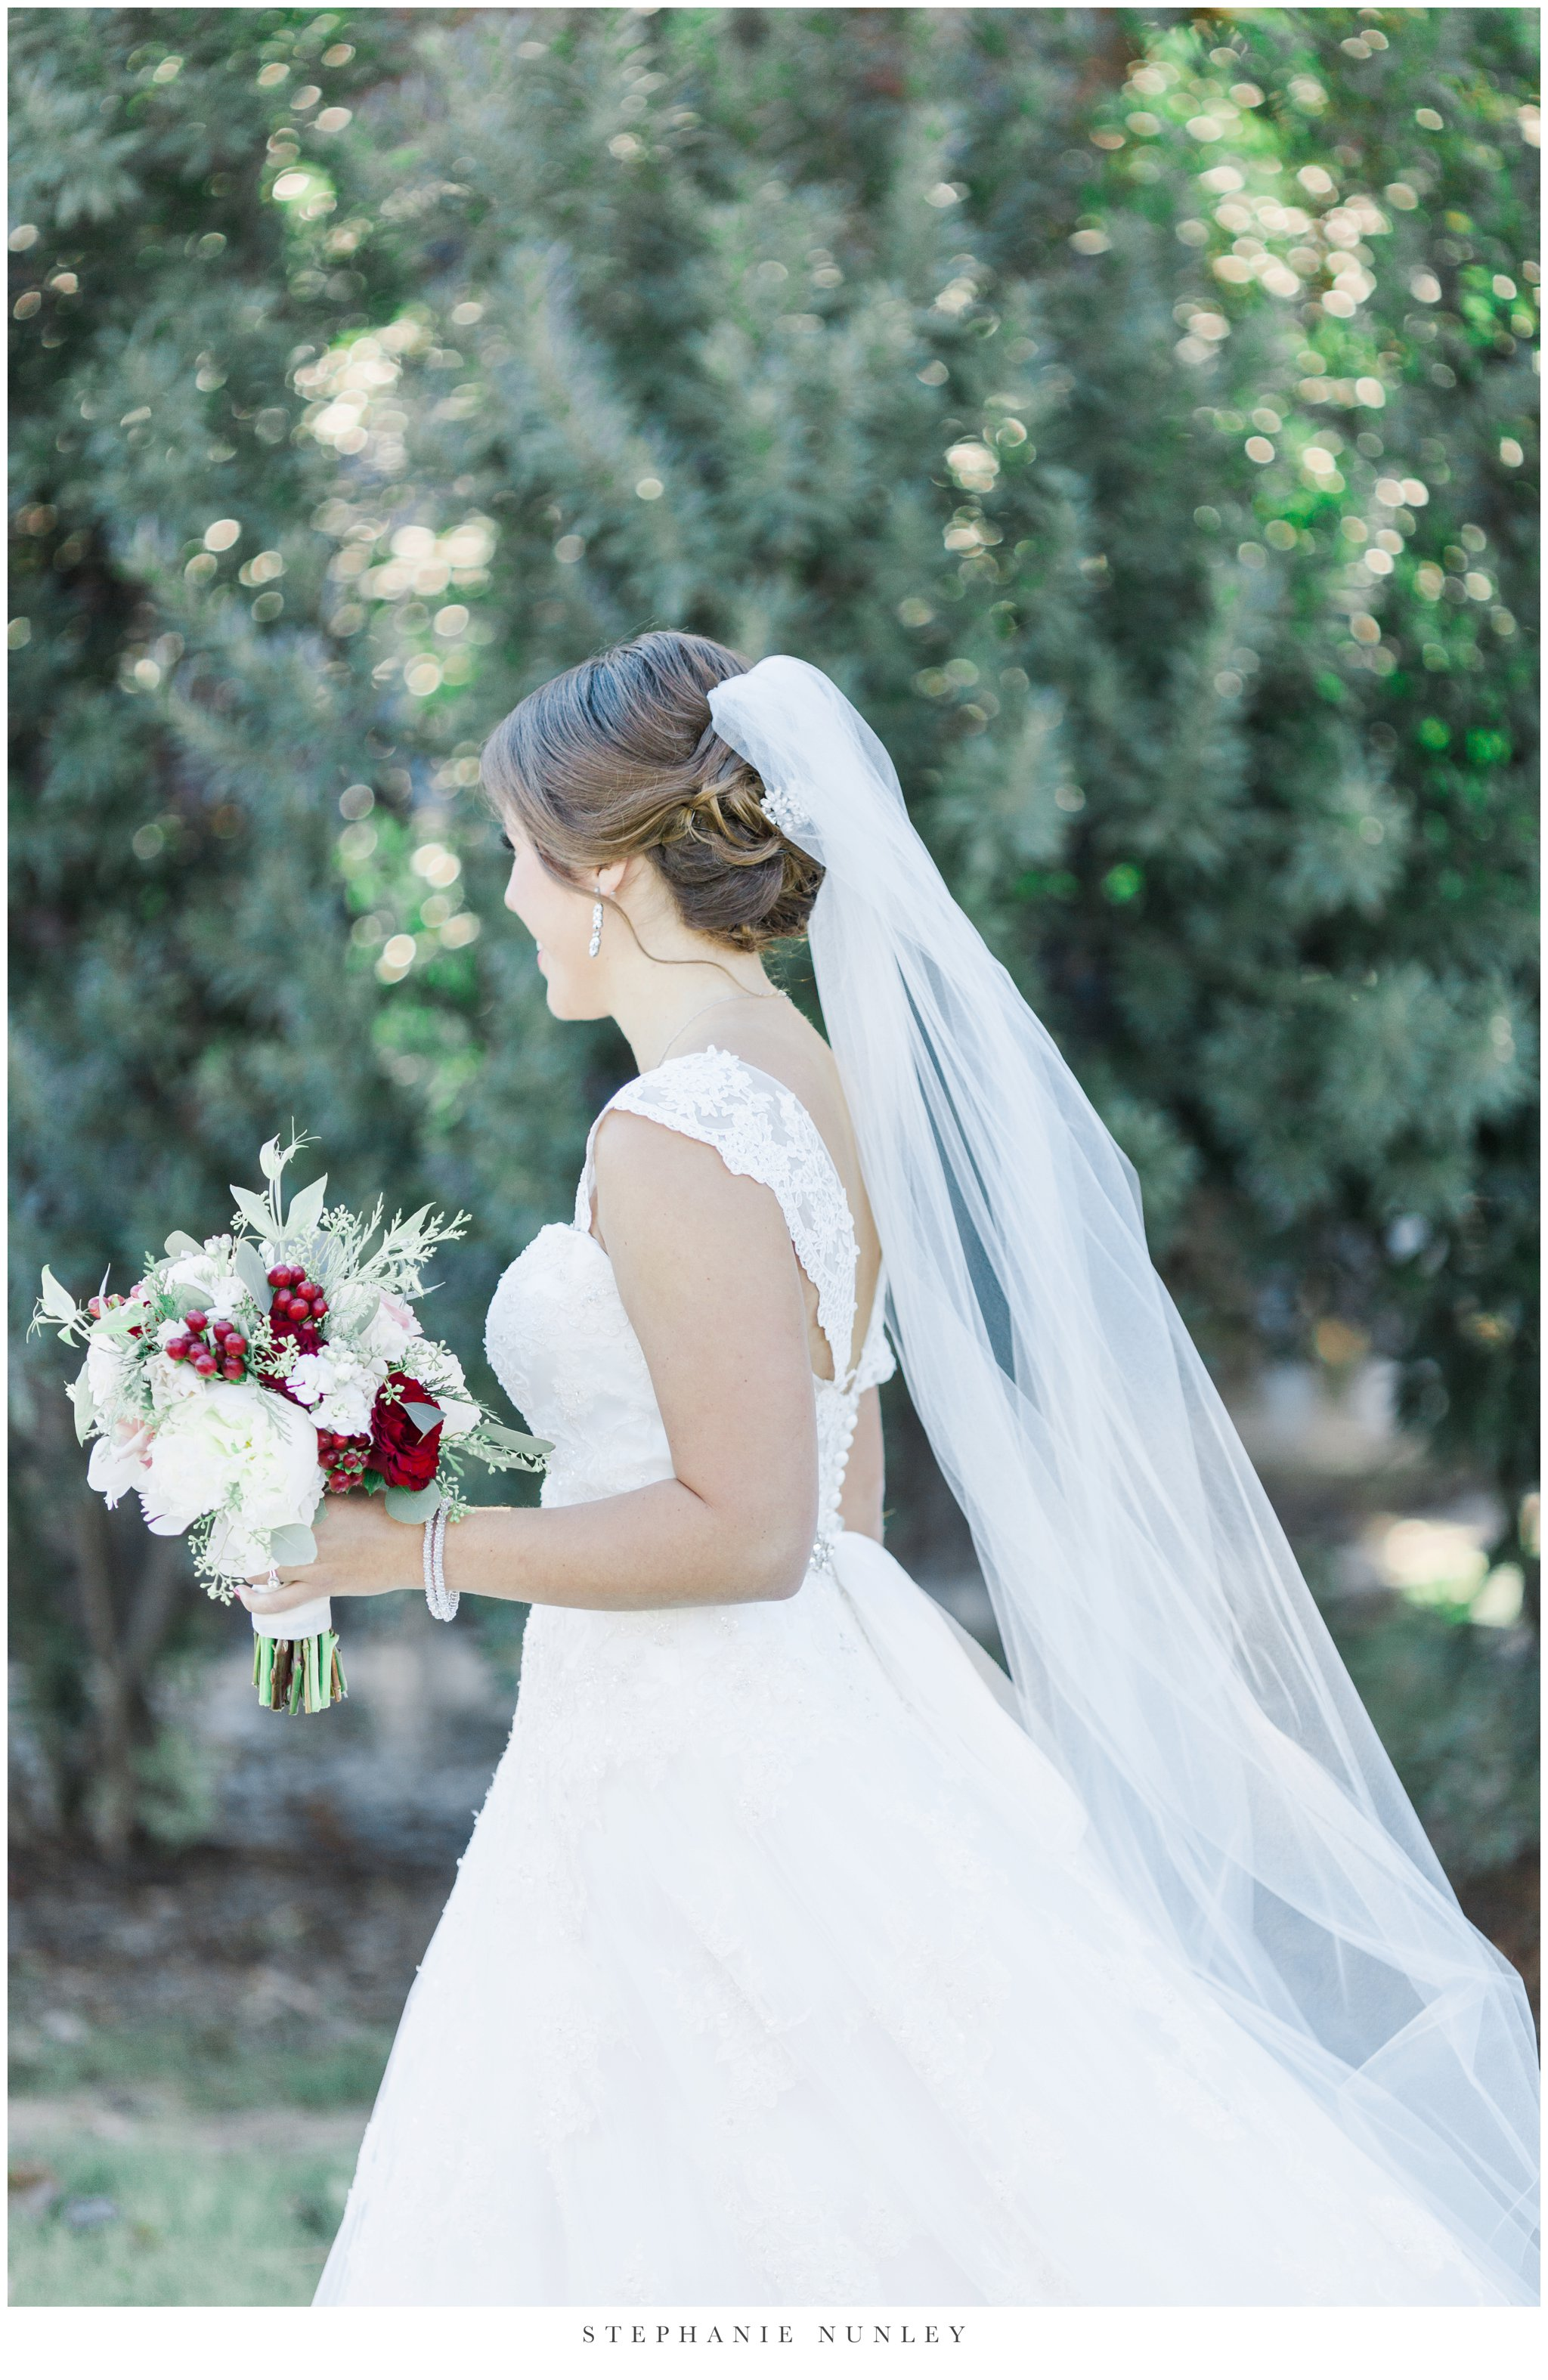 prelude-to-winter-wedding-photos-0016.jpg